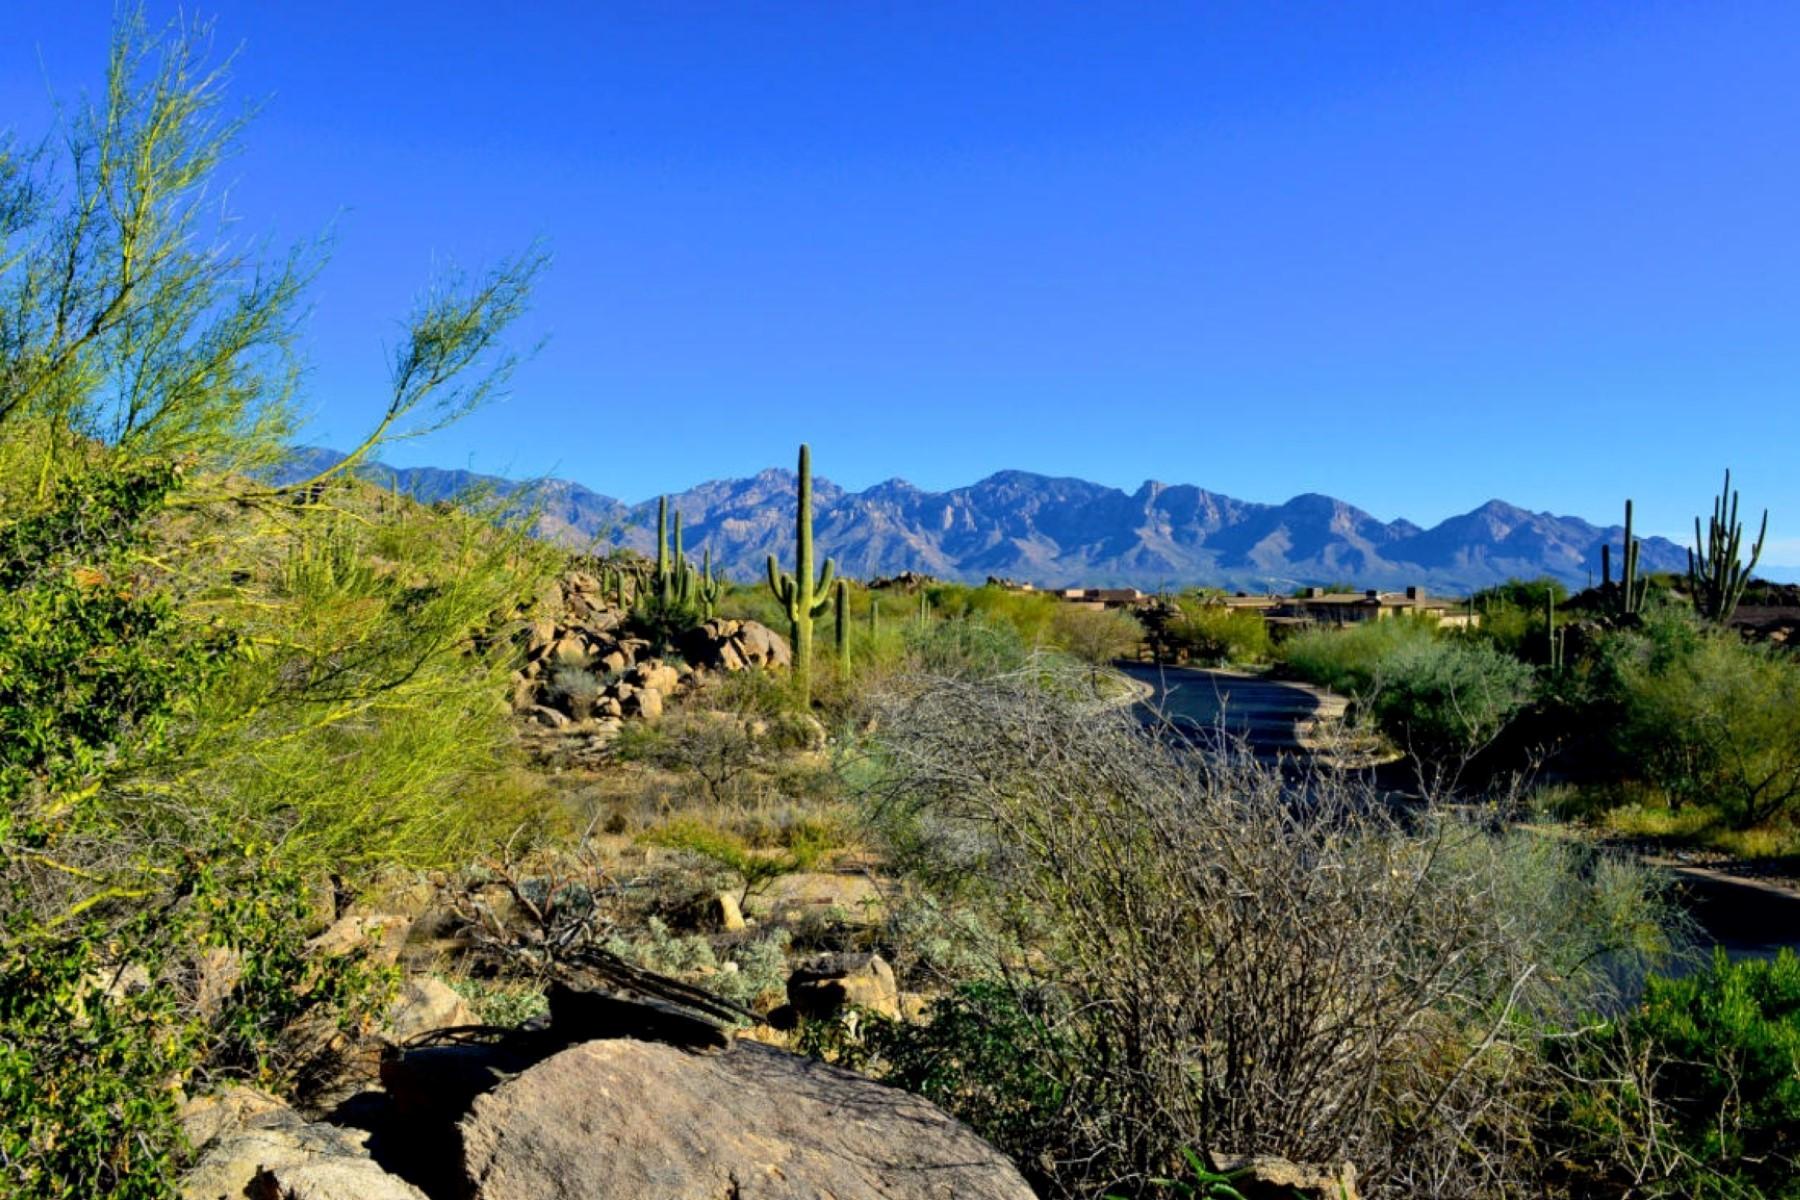 Terreno por un Venta en Truly Awesome Stone Canyon View Lot 1197 W Tortolita Mountain Circle #188 Oro Valley, Arizona 85755 Estados Unidos